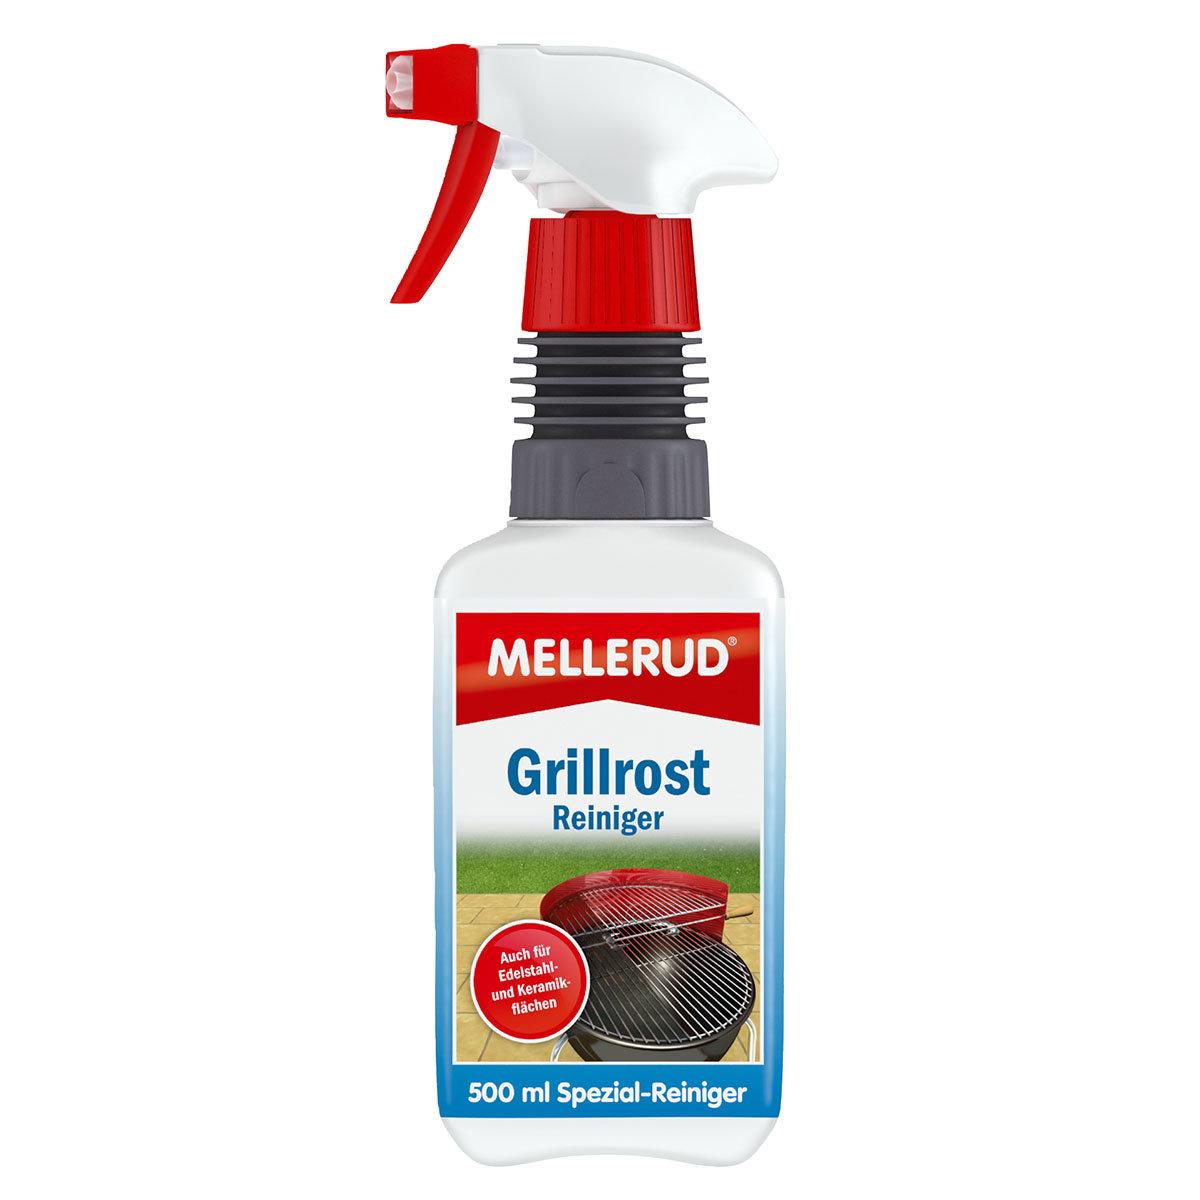 MELLERUD® Grillrost Reiniger 0,5 l